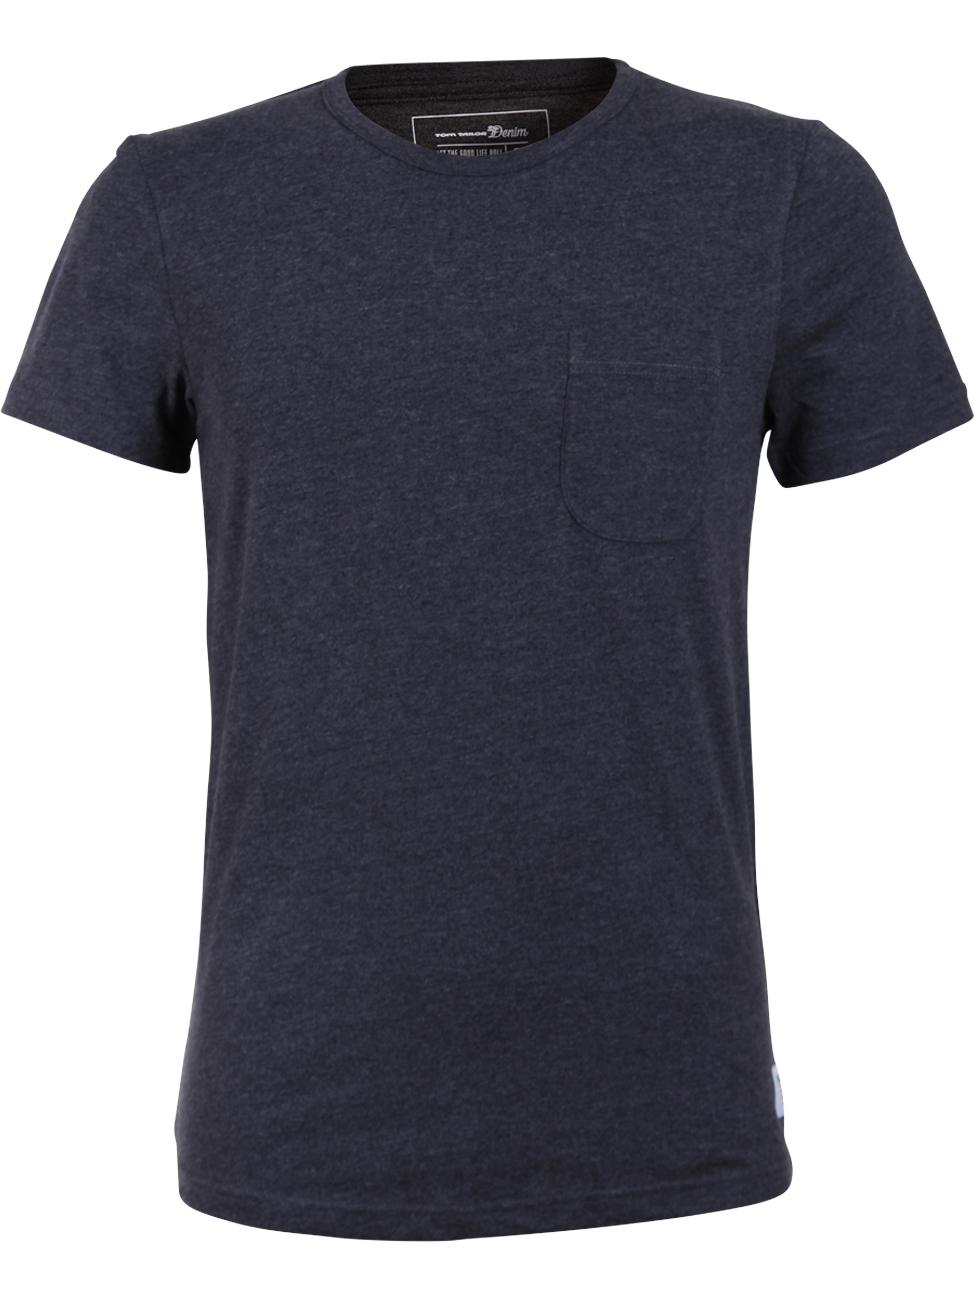 tom tailor denim herren t shirt crewneck mit tasche ebay. Black Bedroom Furniture Sets. Home Design Ideas